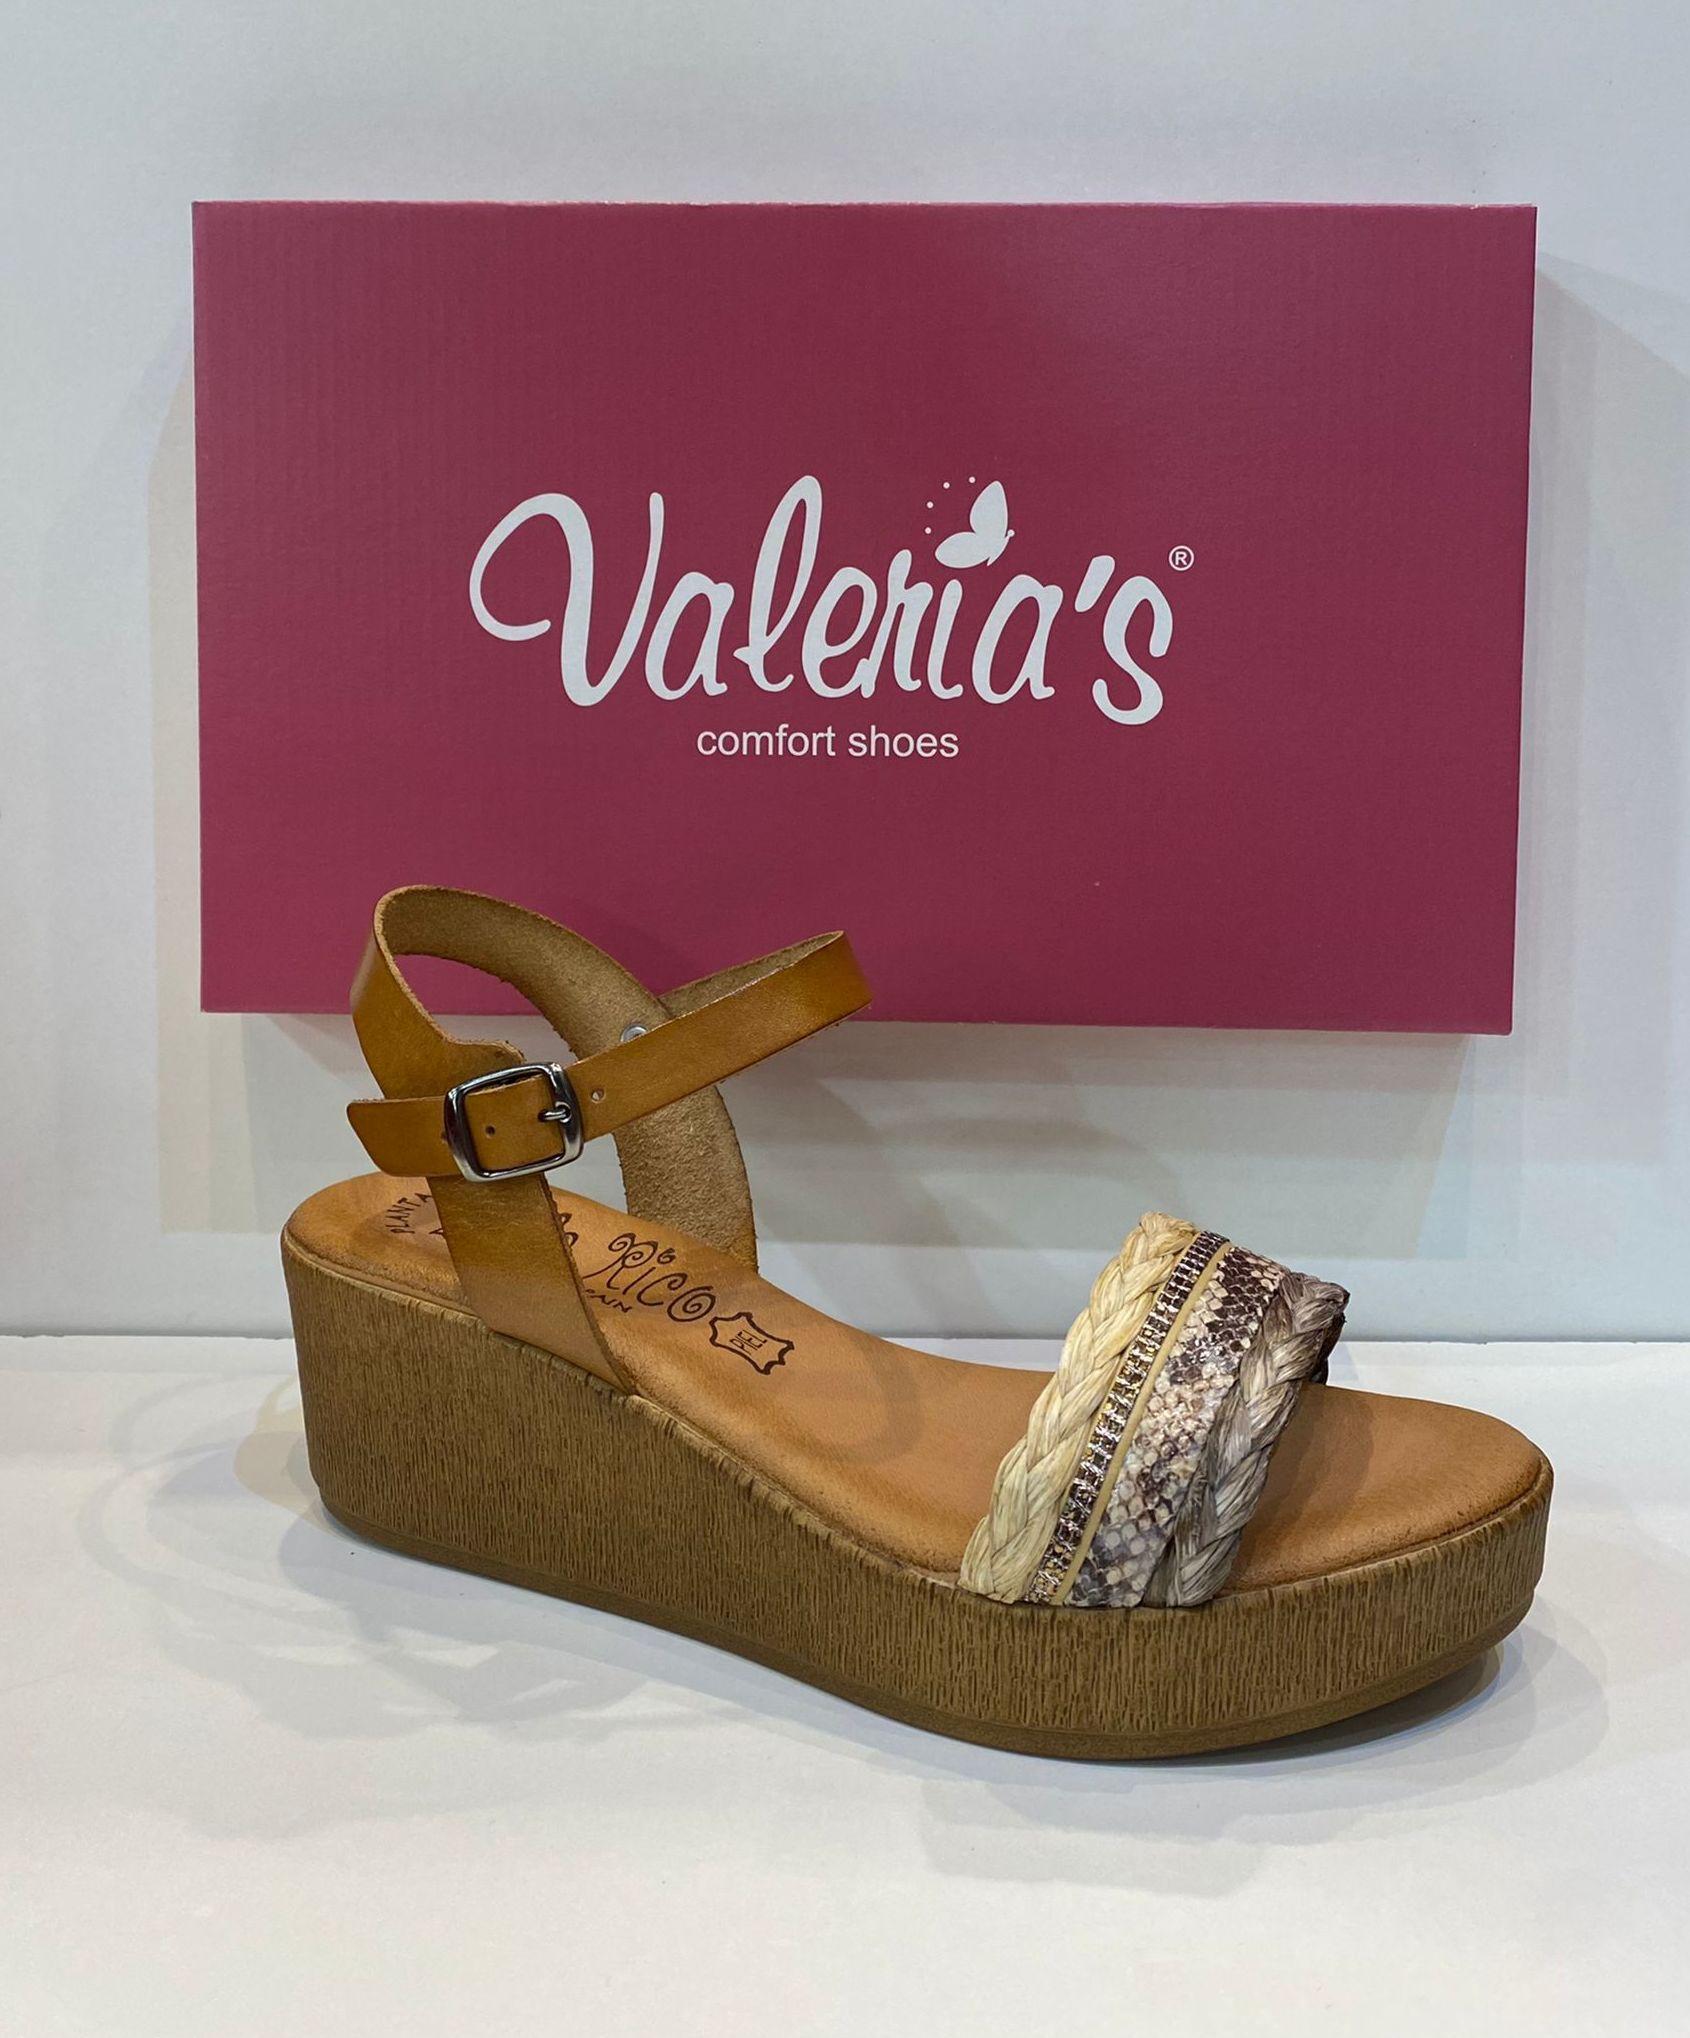 Sandàlia de dona, de la marca Valeria's, plantilla de gel de viscoelàstica, sola de politilè 36€ www.calzadosllinas.es